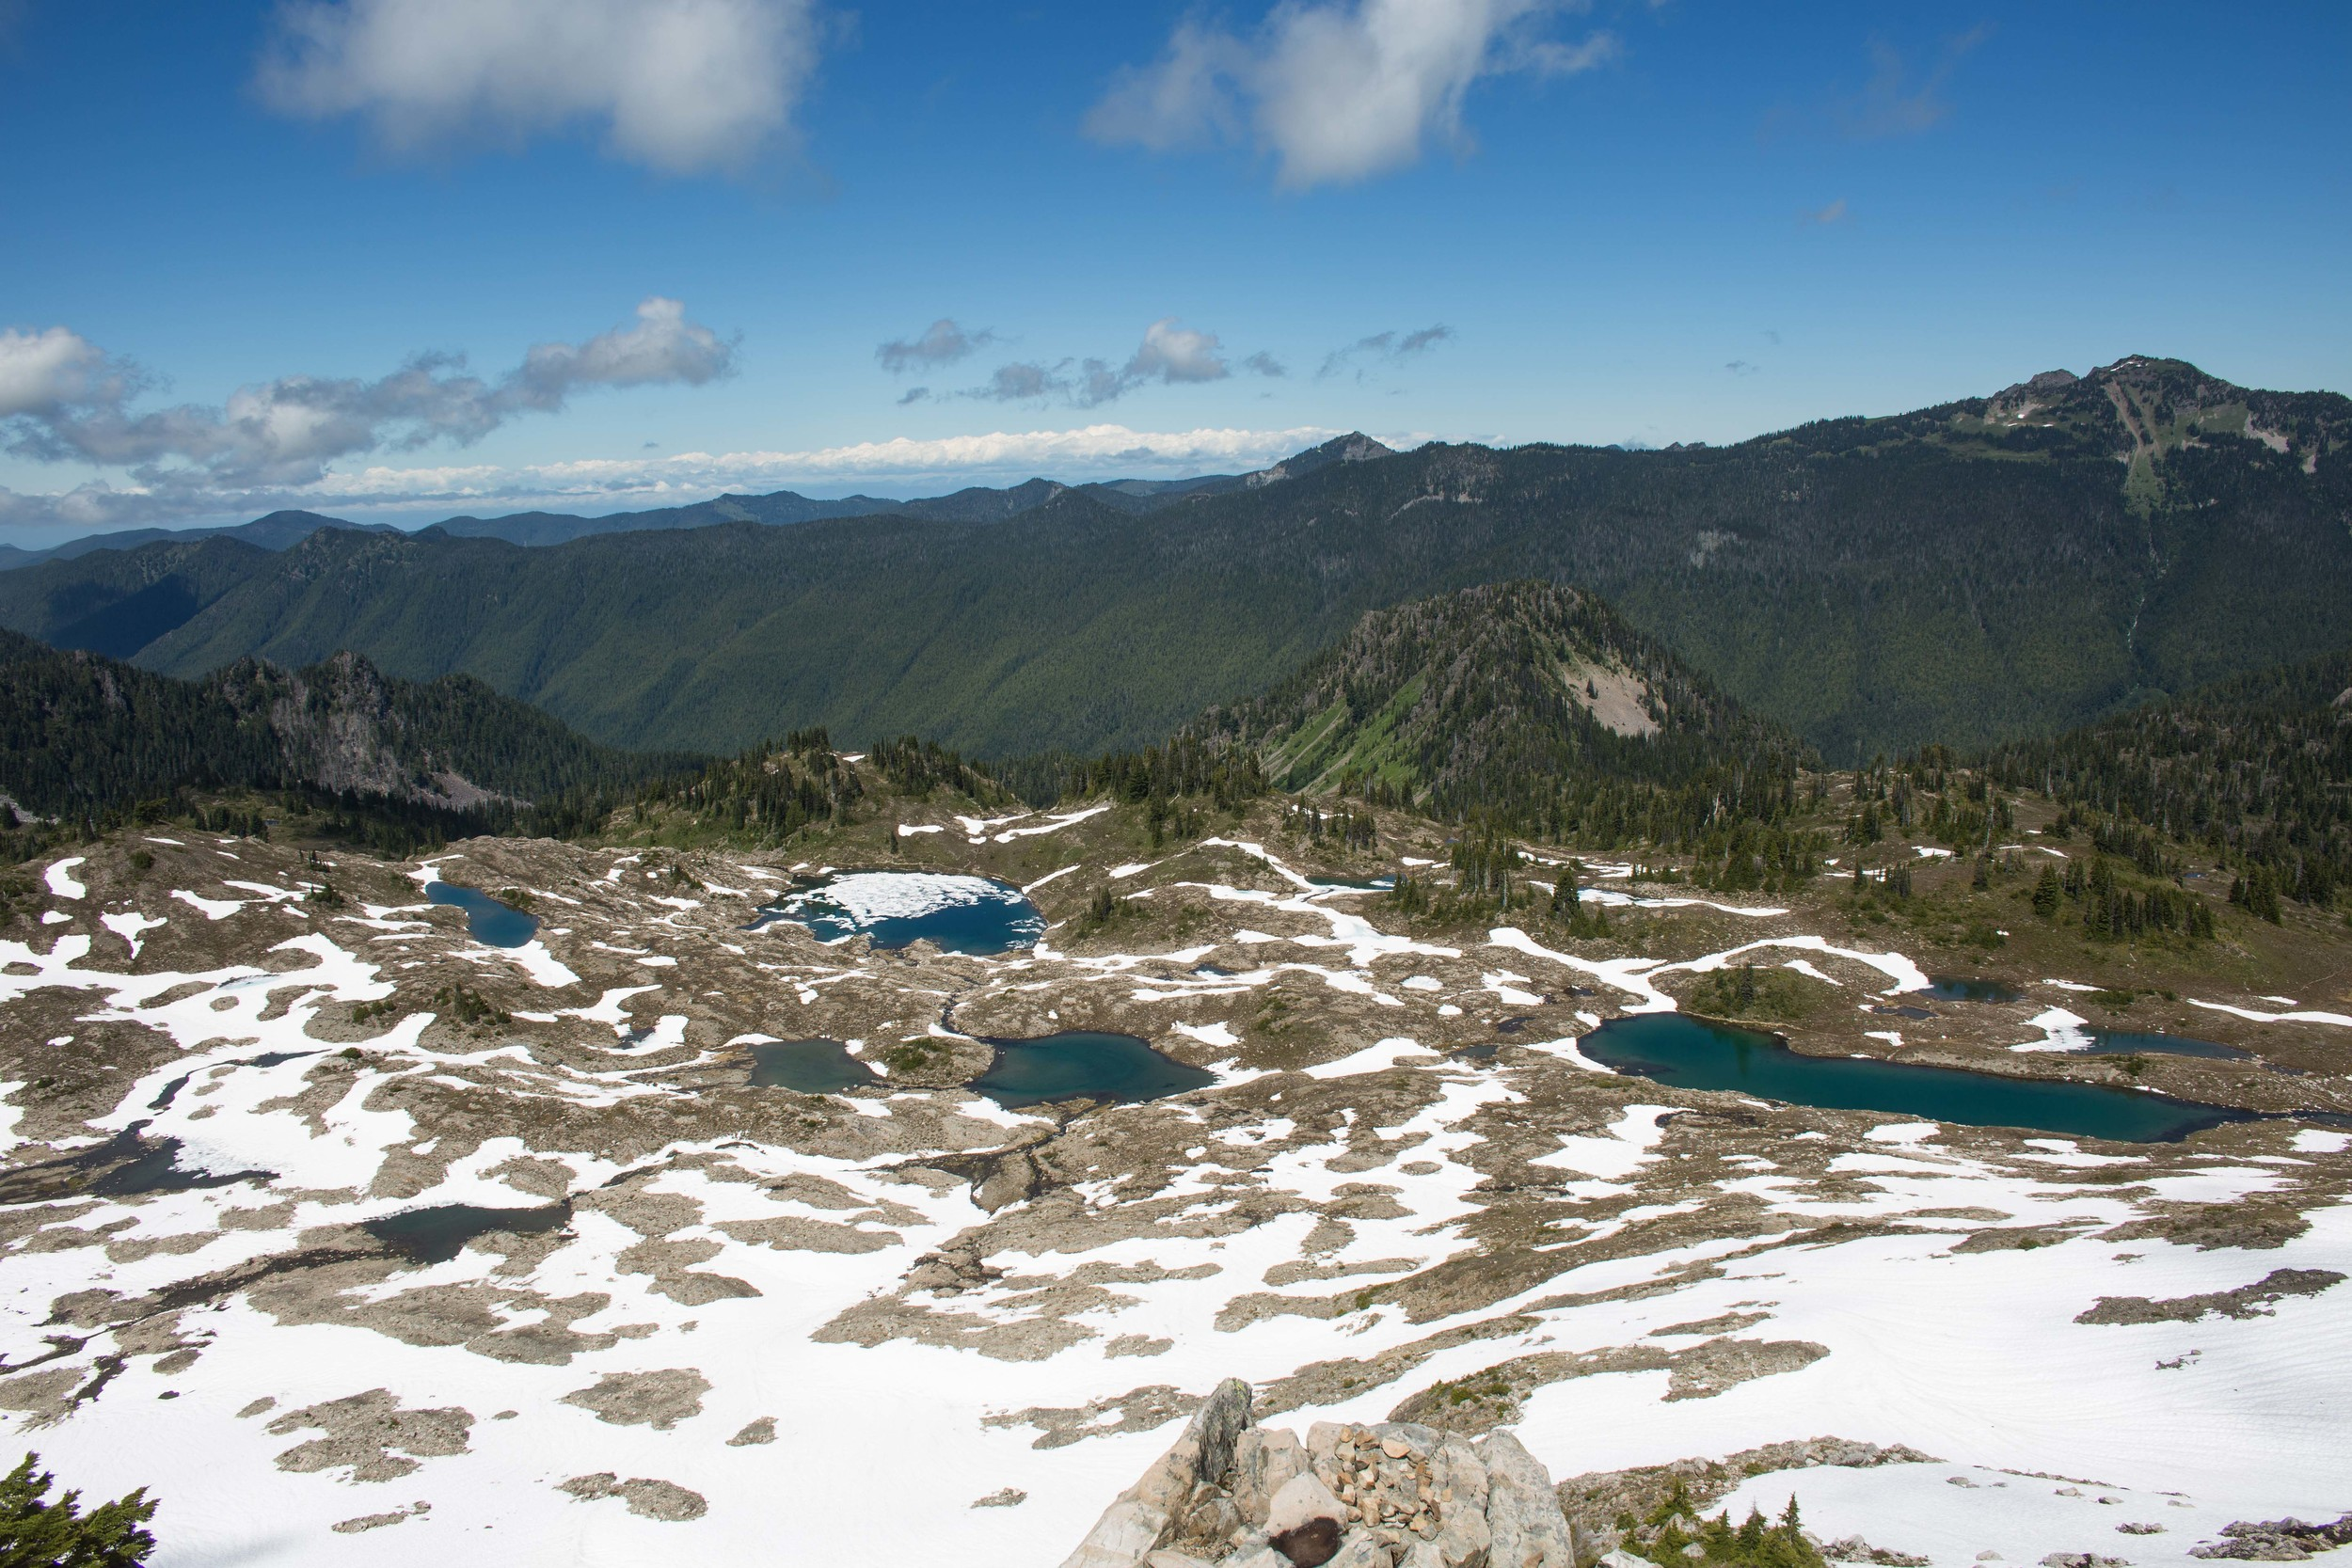 Seven Lakes basin from Bogachiel Peak